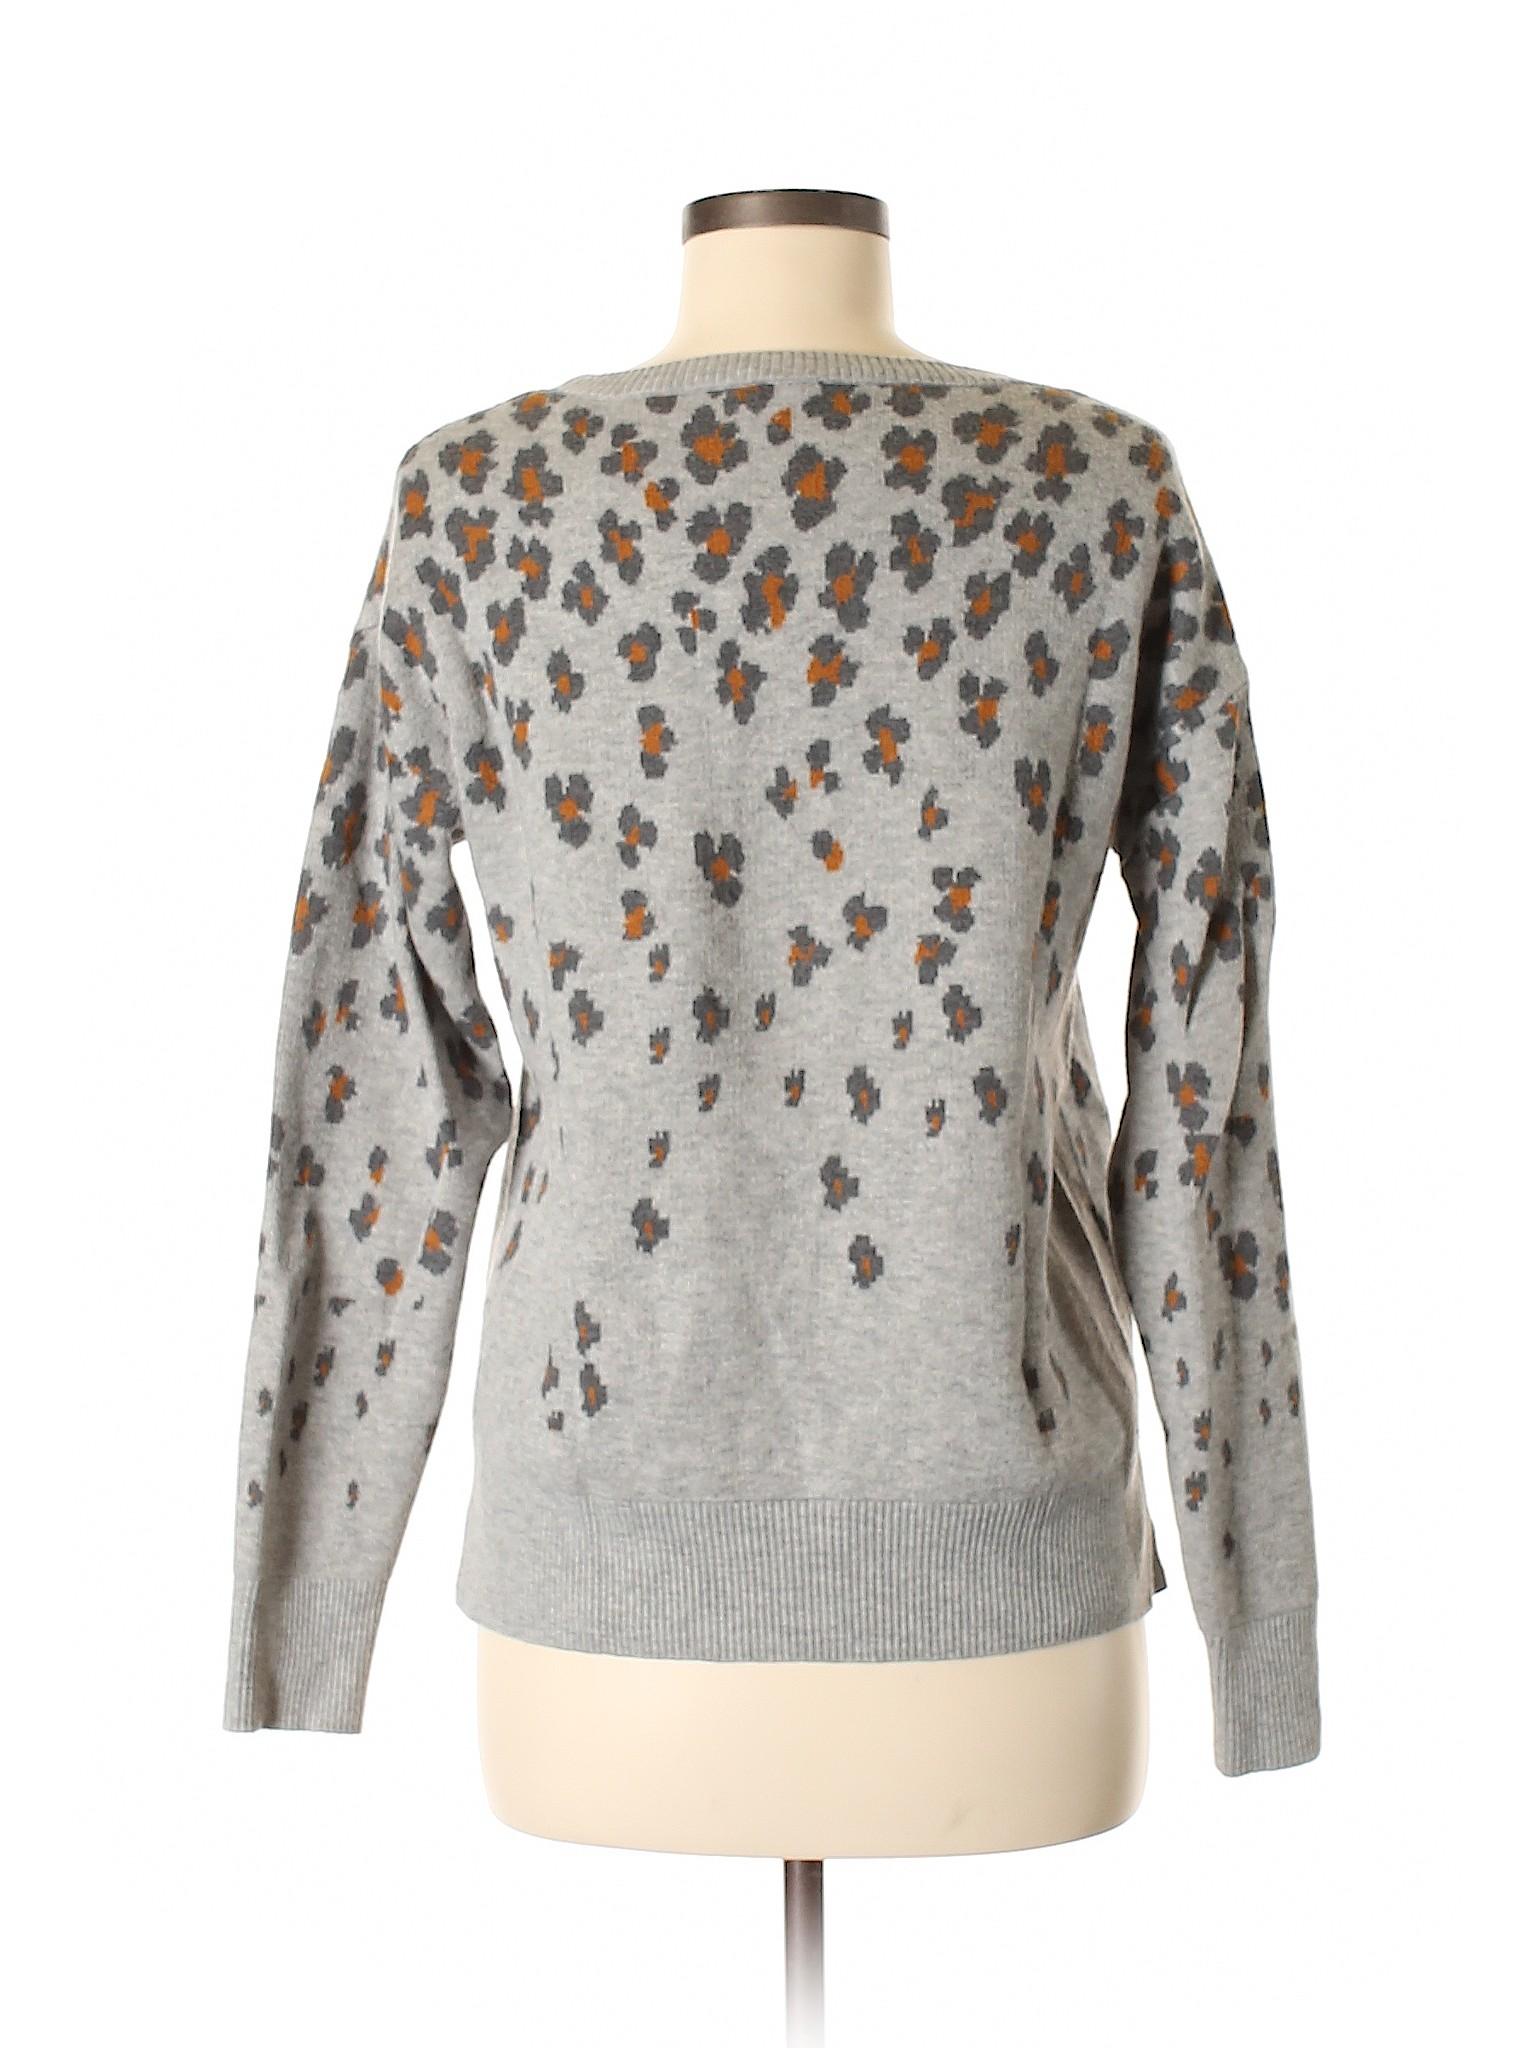 Boutique Gap Pullover Sweater Boutique Gap xXzqaz780